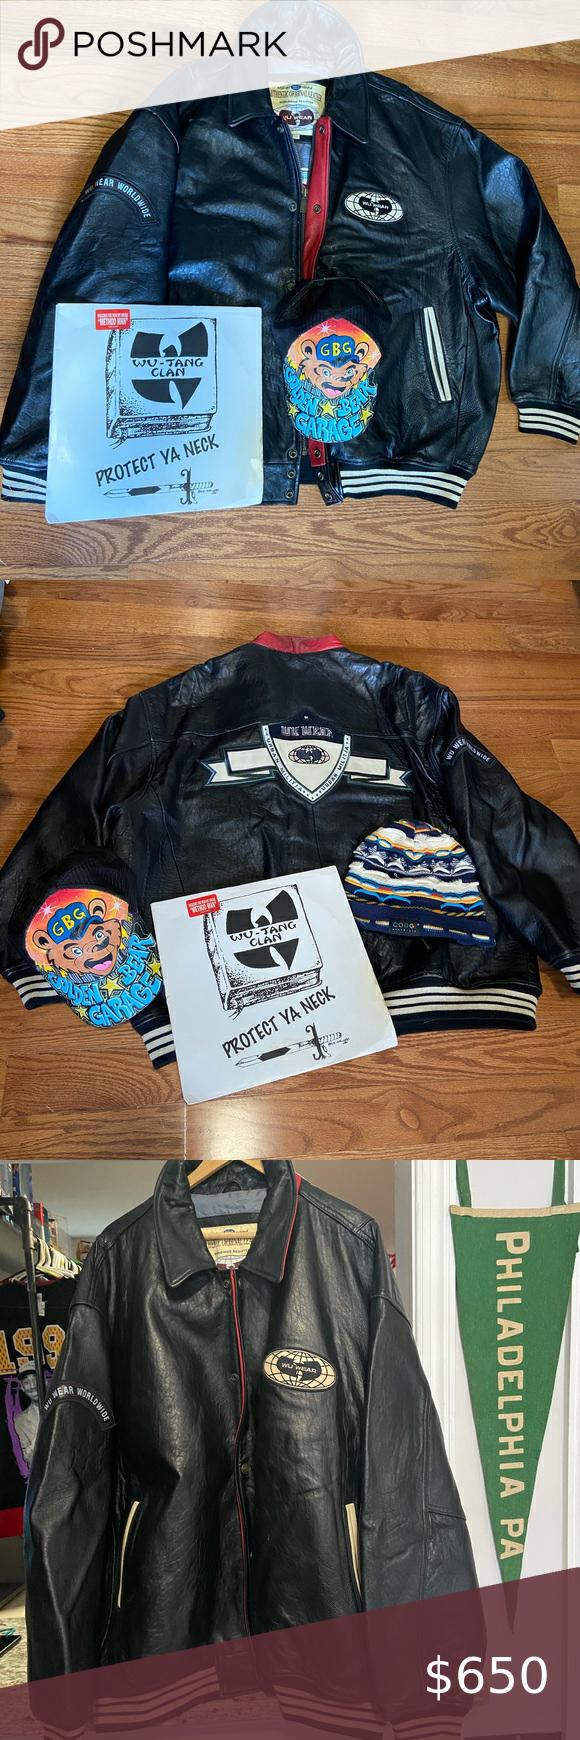 Vintage Wu Tang Wu Wear Leather Bomber Jacket Bomber Jacket Vintage Leather Bomber Jacket Leather Bomber [ 1740 x 580 Pixel ]